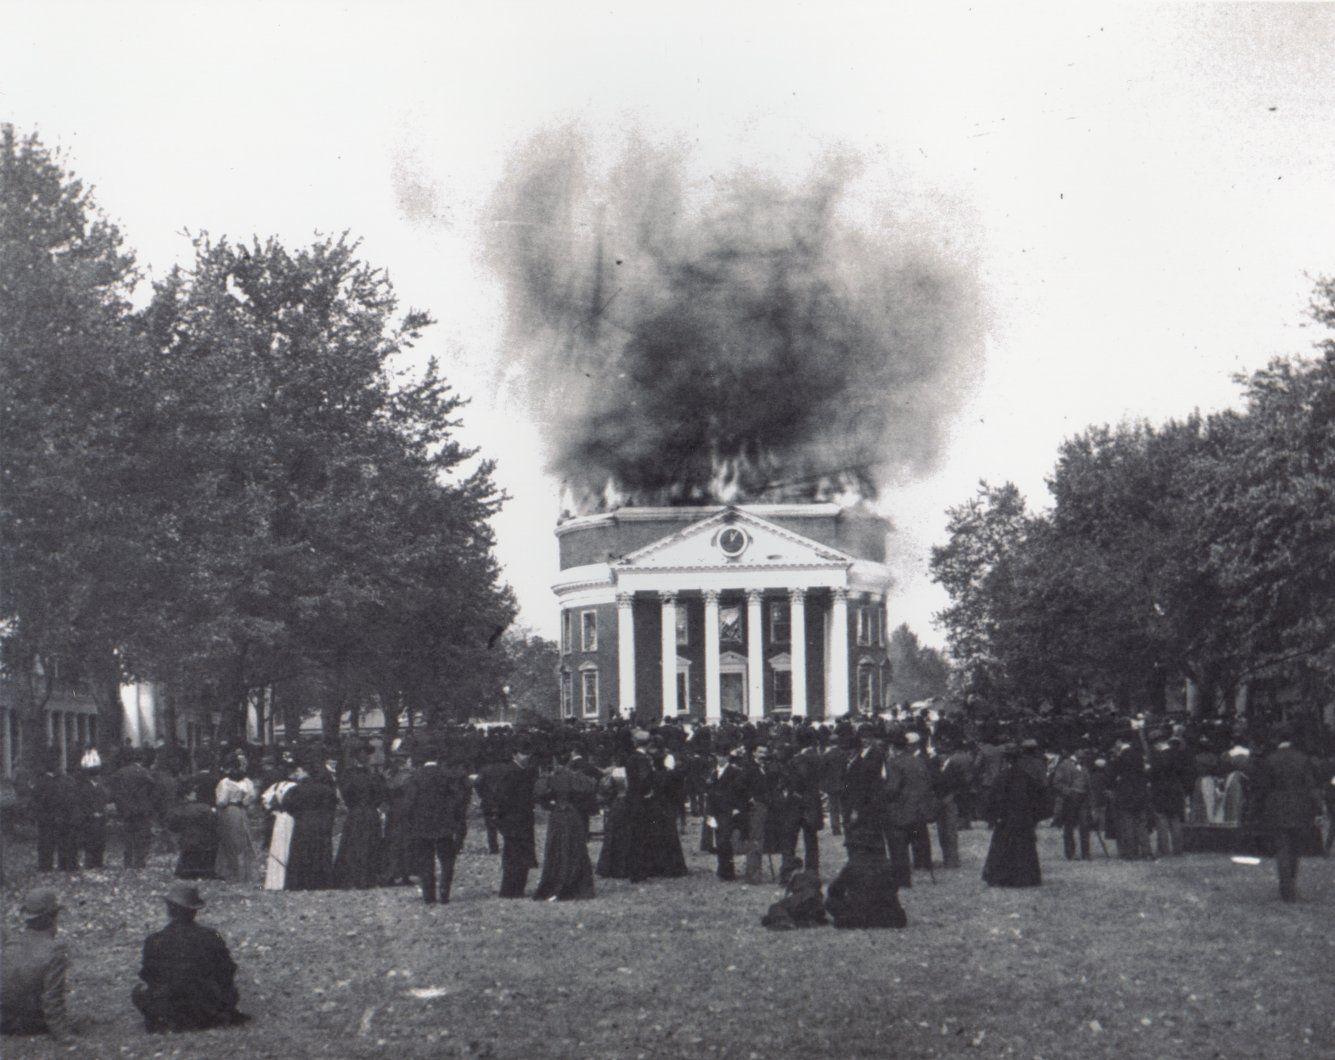 Uva Rotunda On Fire University Of Virginia Virgo University Of Virginia Virginia History Old Time Photos